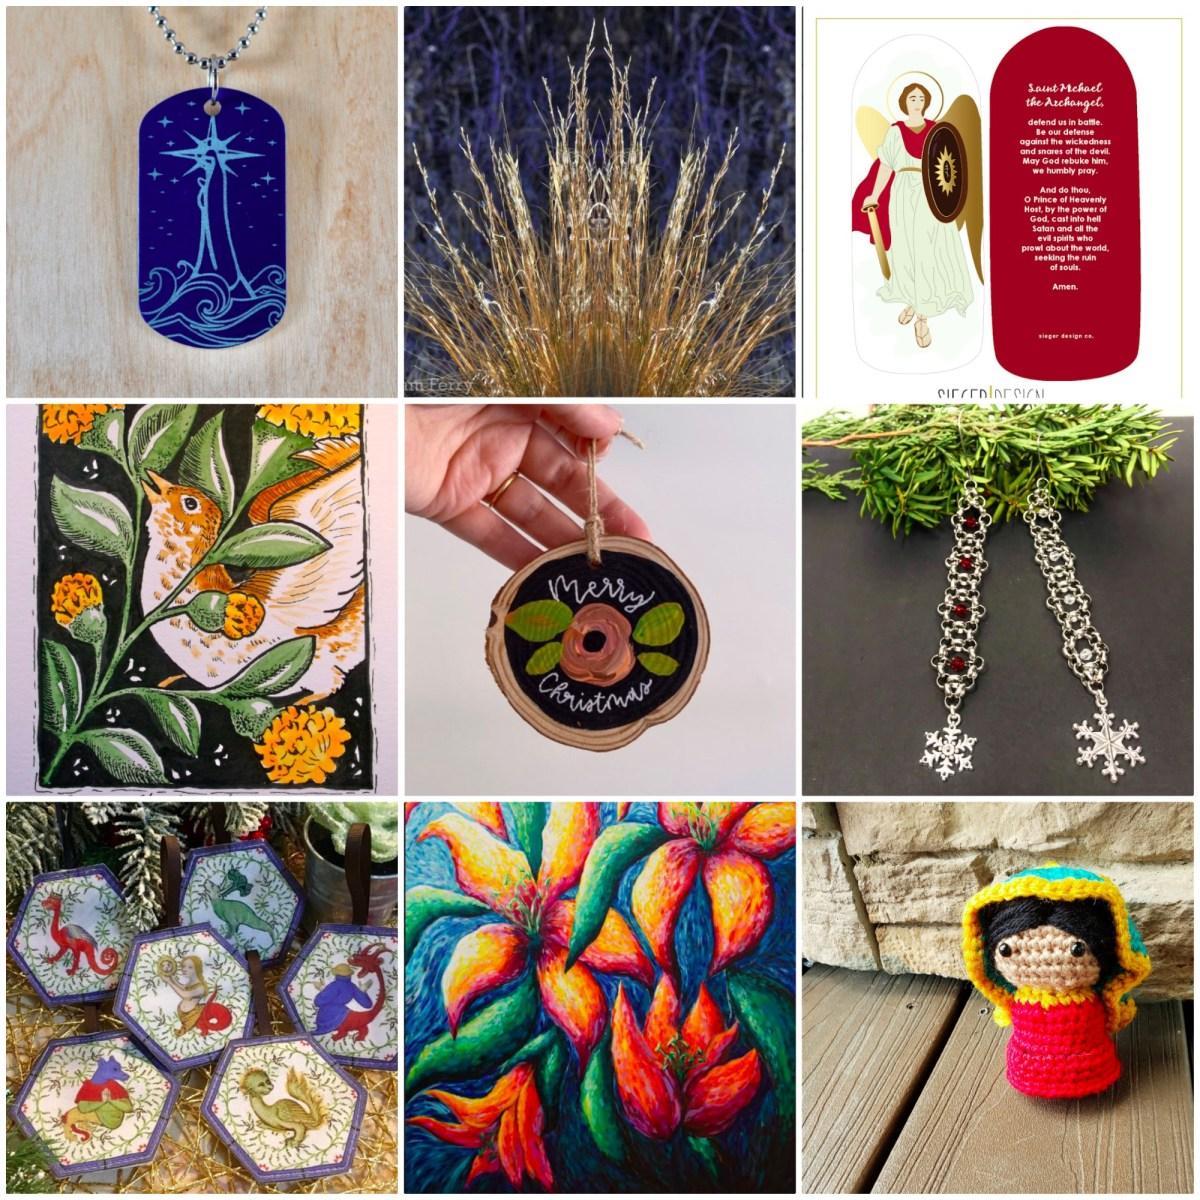 2019 Catholic fine art and handmade gift guide!